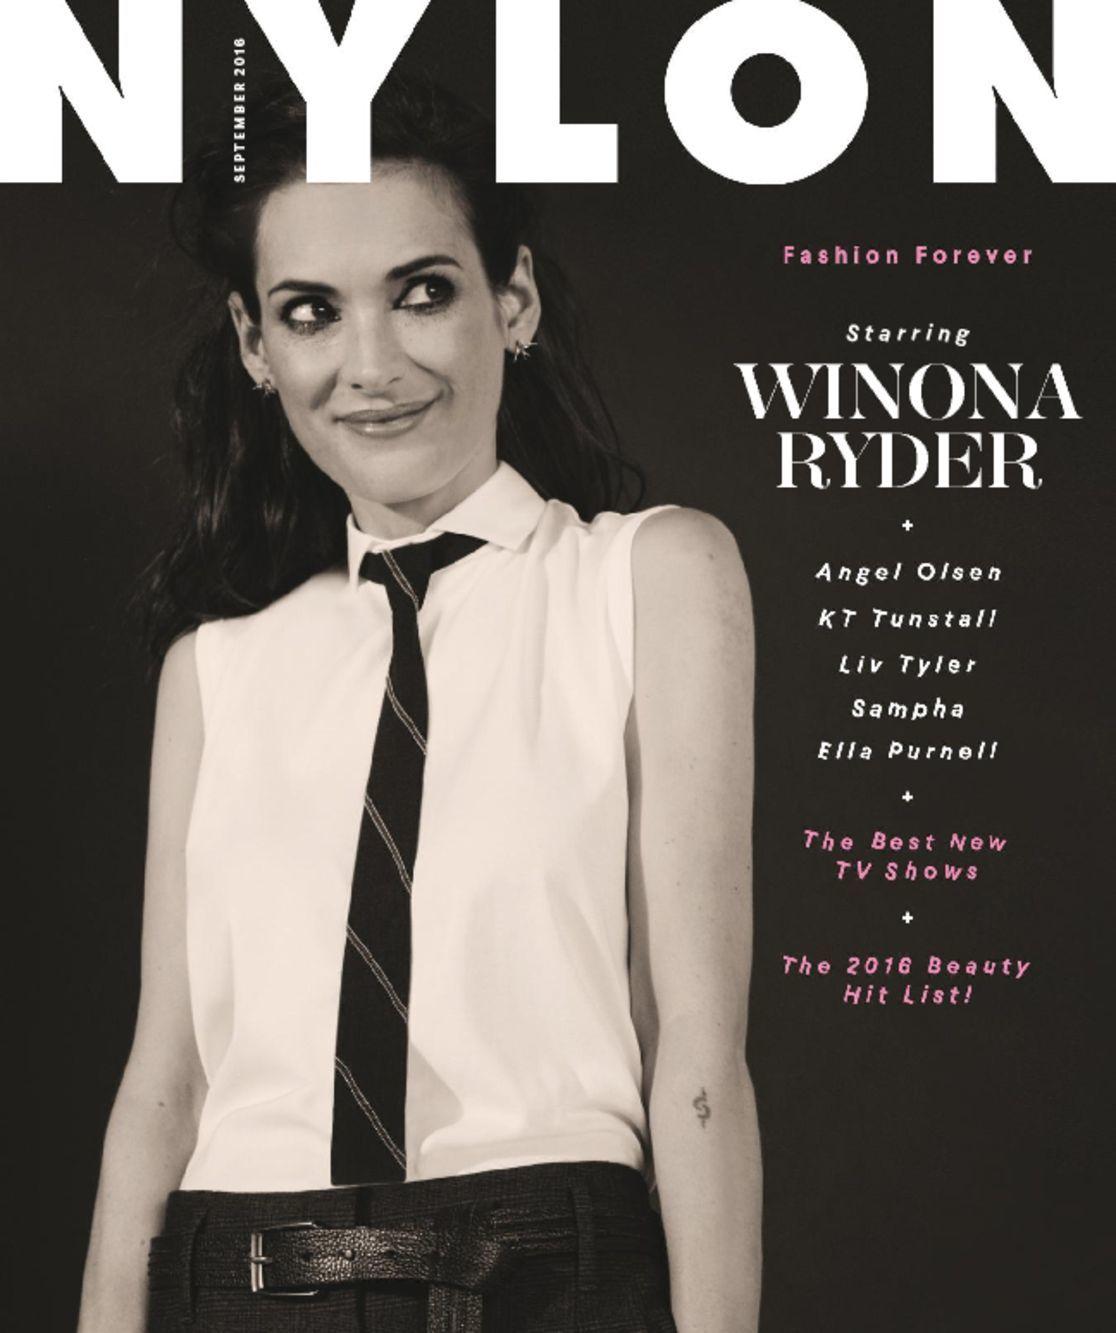 Best Price for Nylon Magazine Subscription